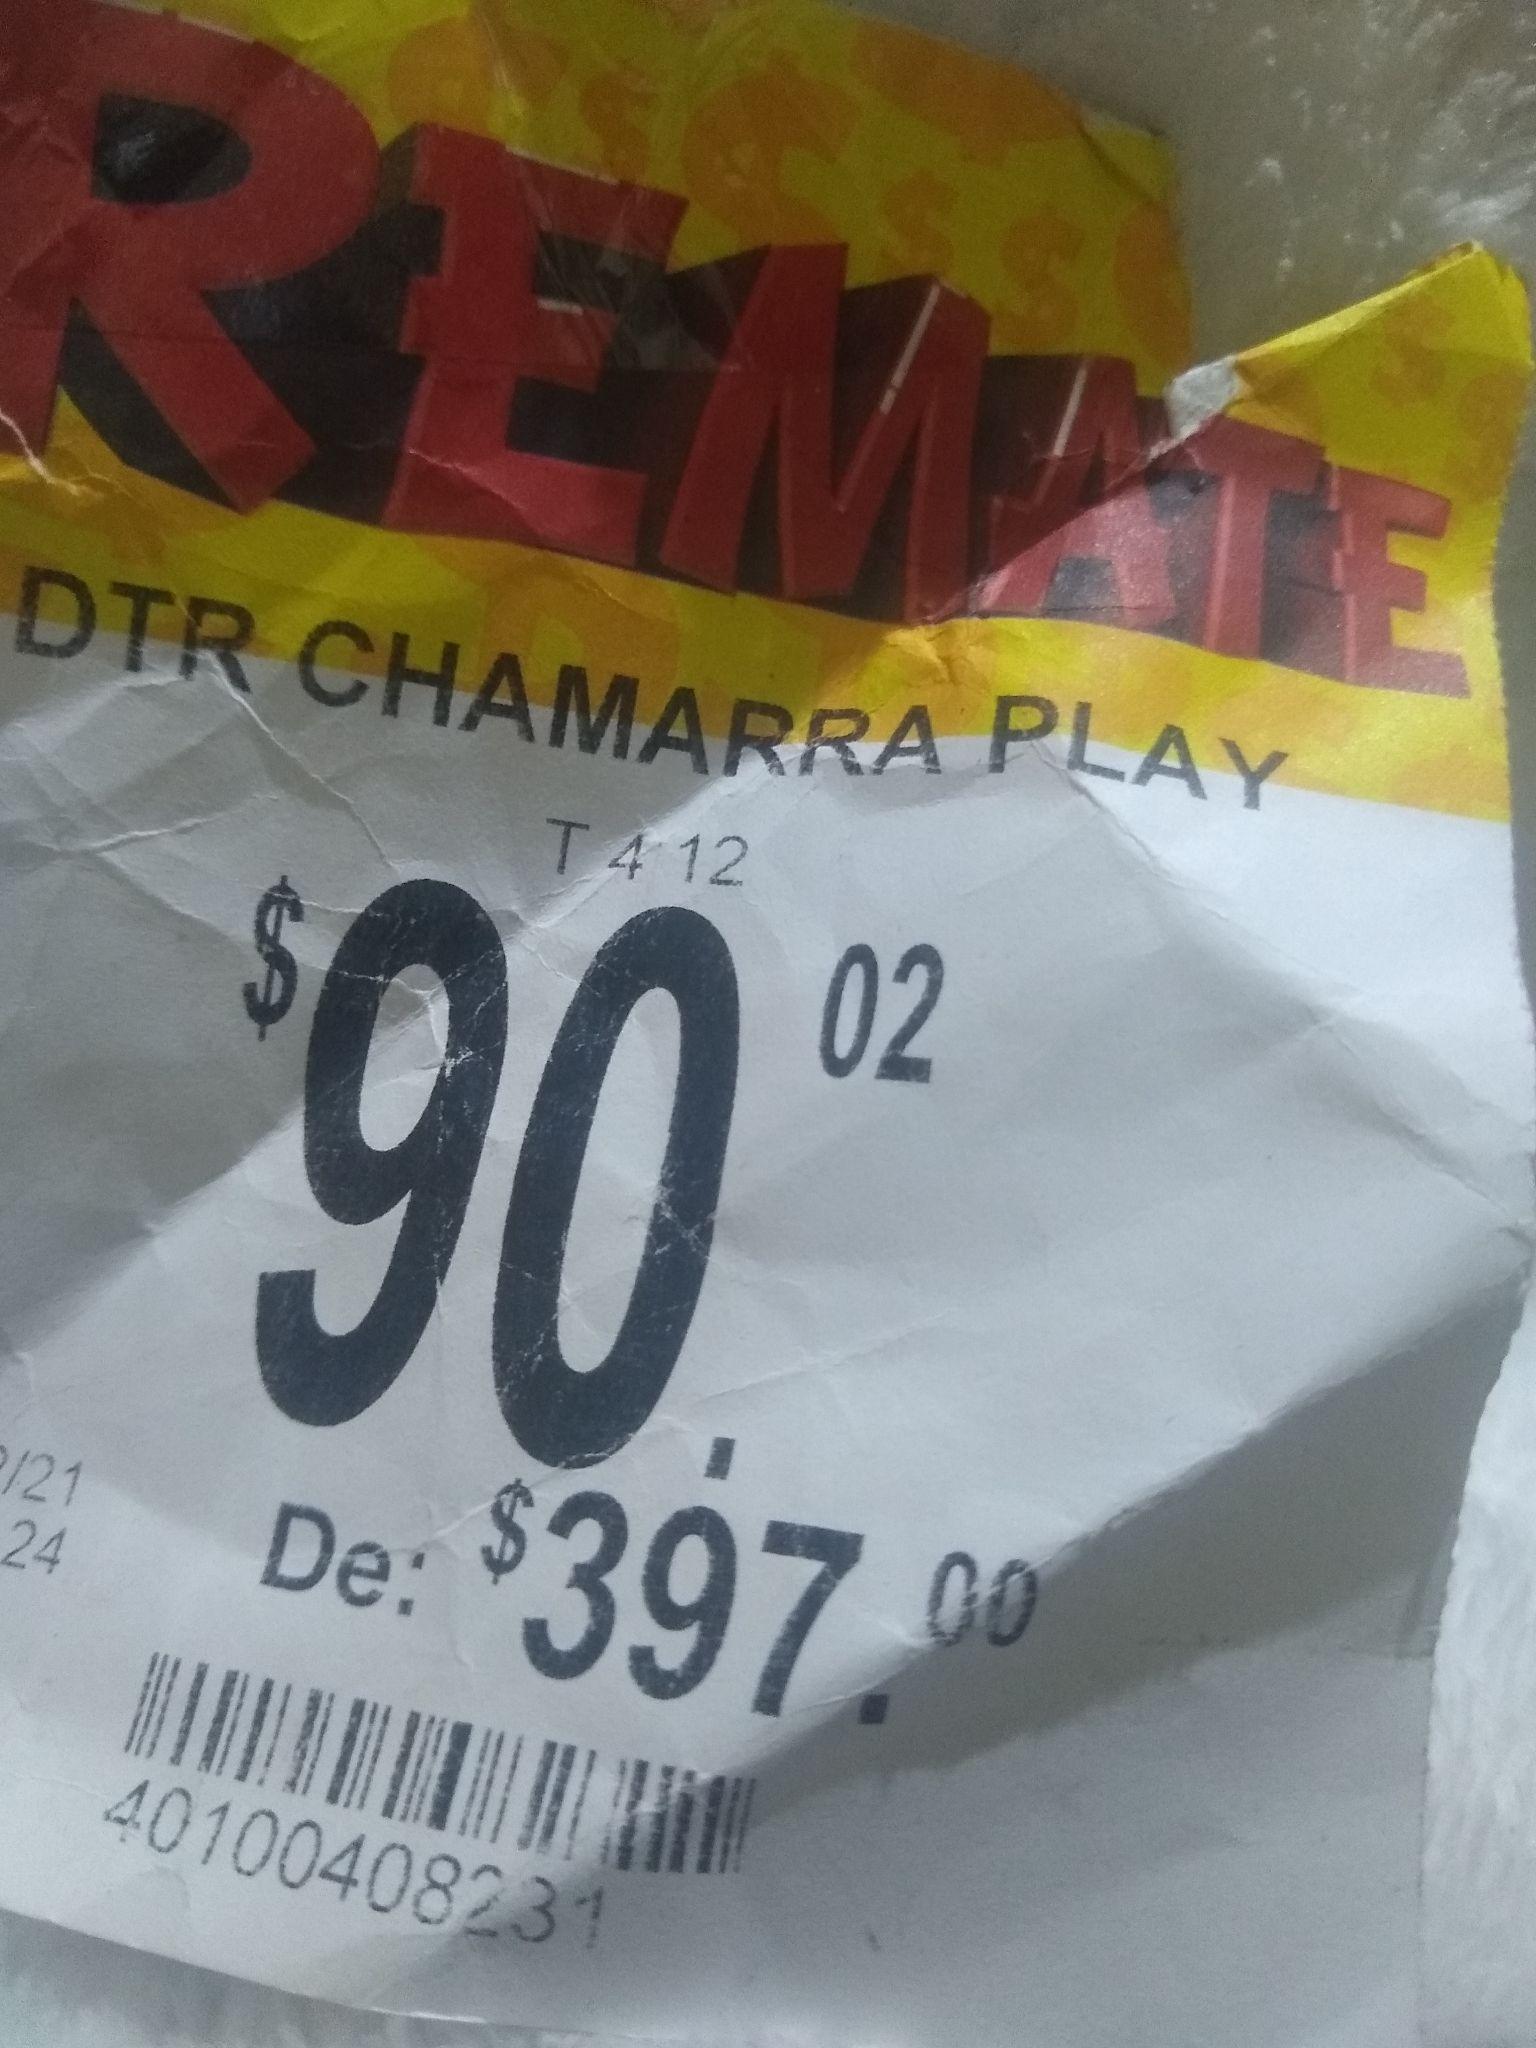 DTR CHAMARRA PLAY ( bodega Aurrera)